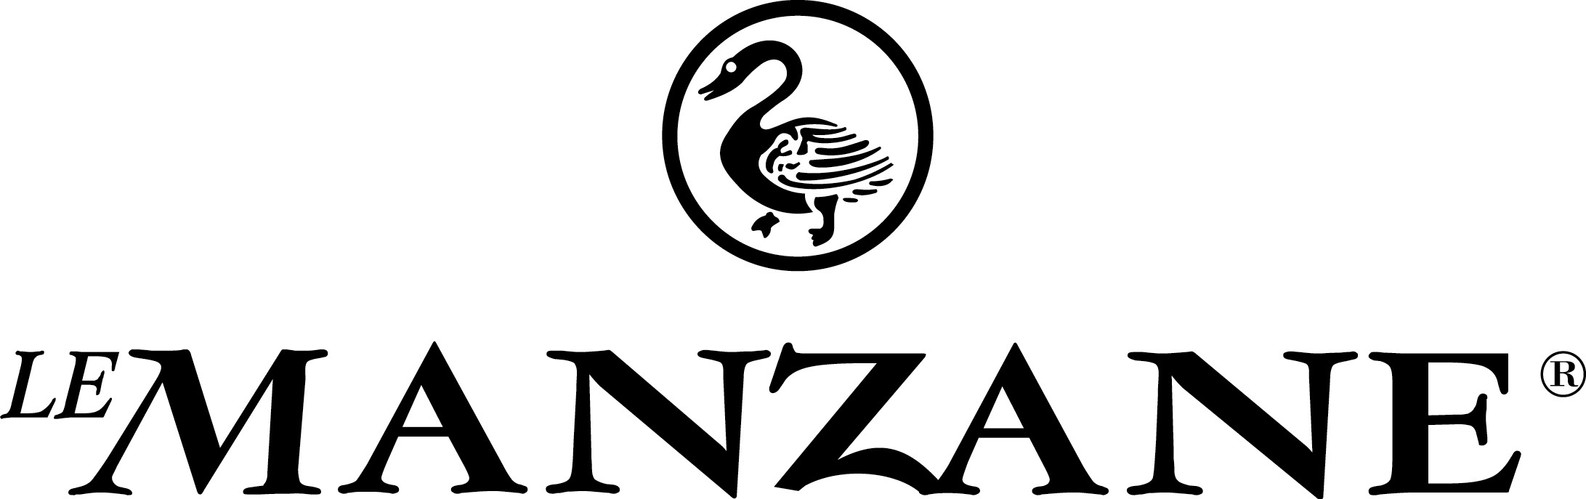 LE MANZANE Wine Shop Online London Wine